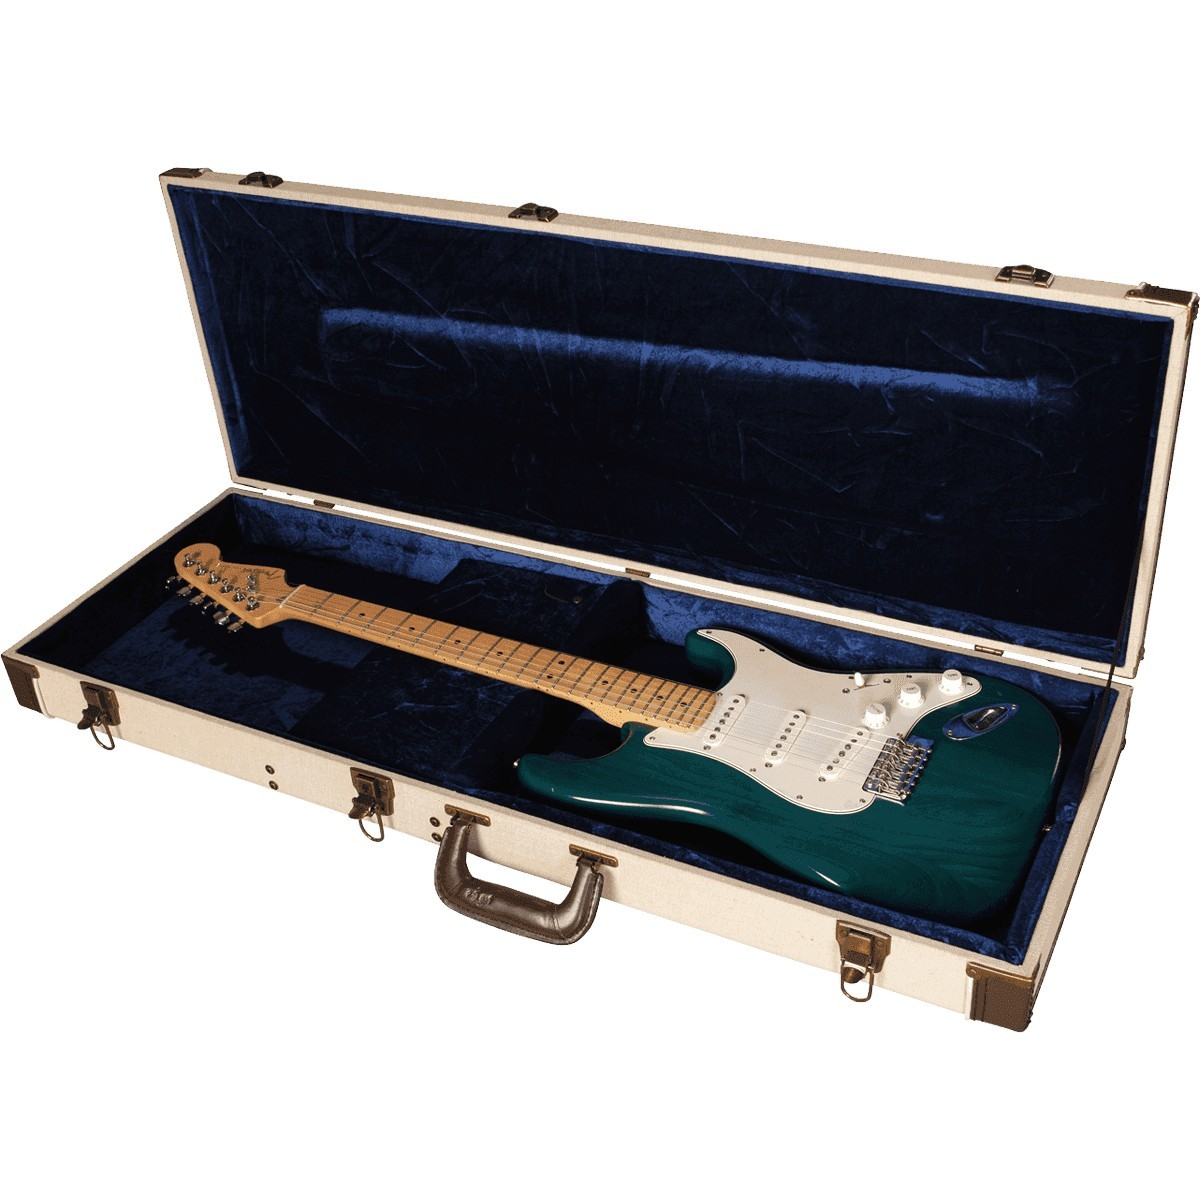 GATOR Etui Guitare Bois Deluxe GW Journeyman Type Electrique